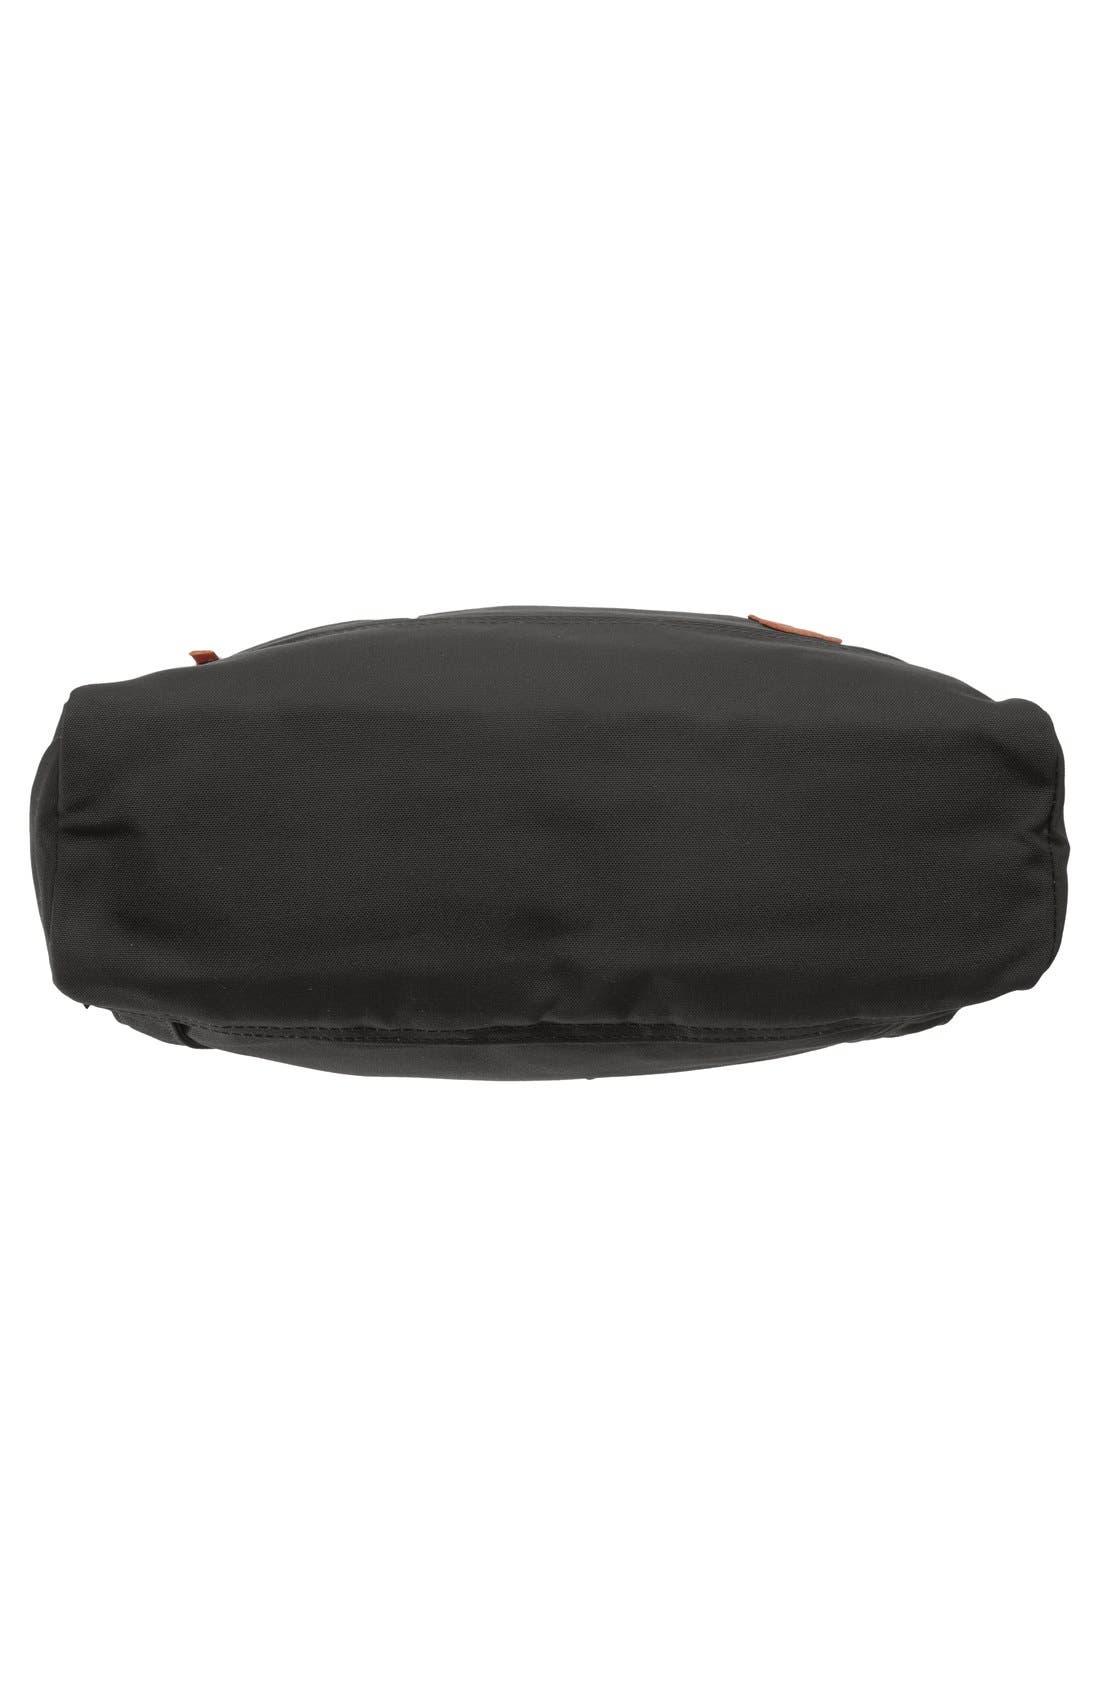 'Totepack No.1' Water Resistant Tote,                             Alternate thumbnail 4, color,                             BLACK